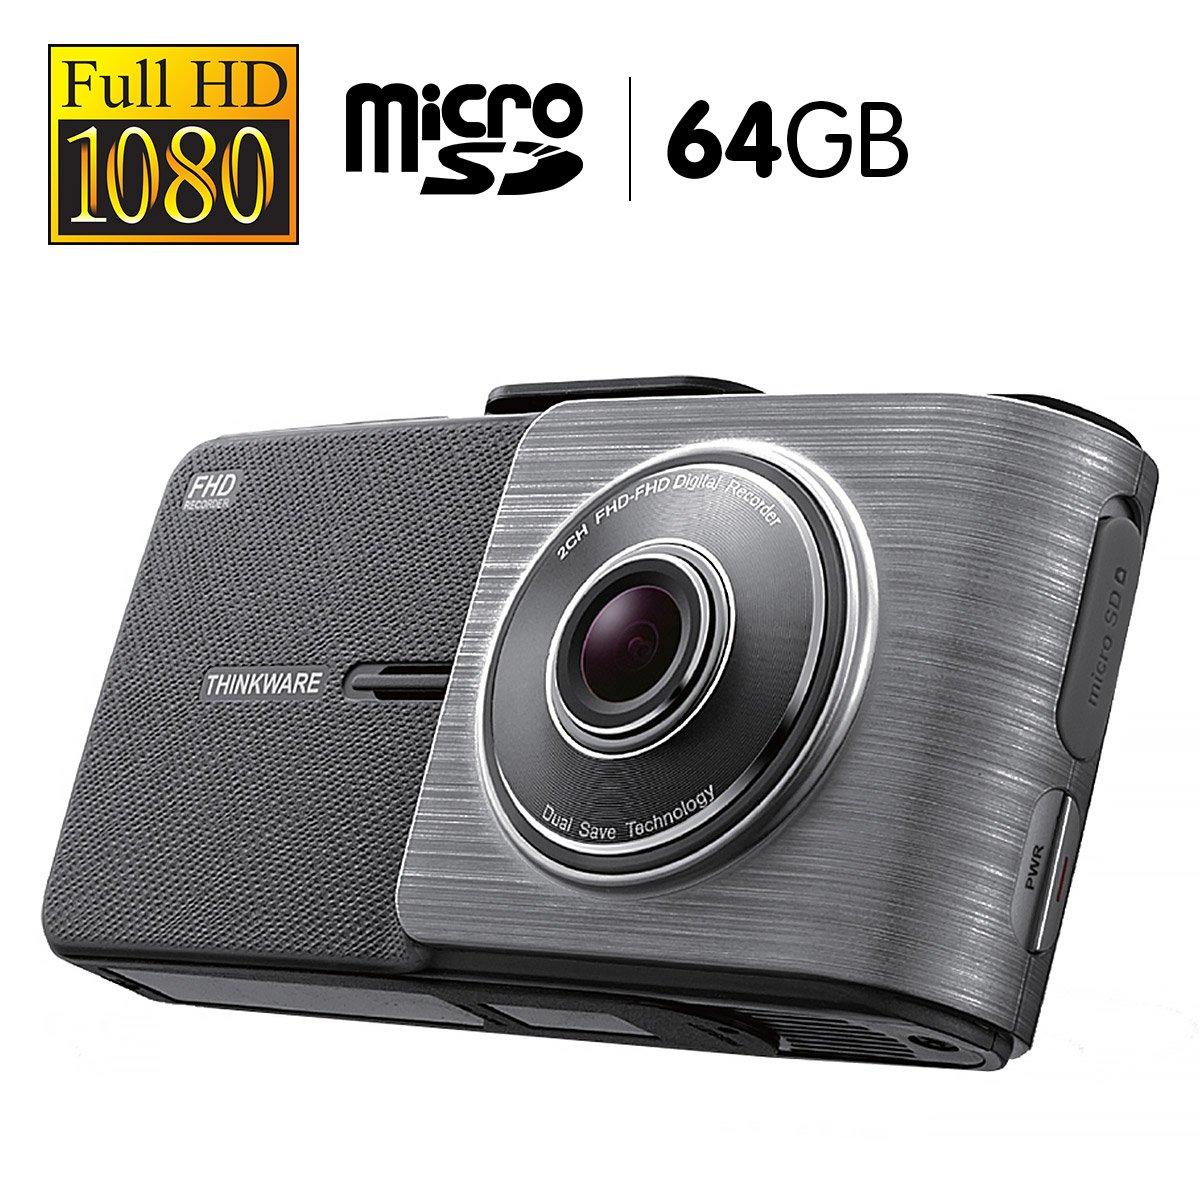 THINKWARE 1080P Full HD Dash Cam With 64GB Micro SD - X55064